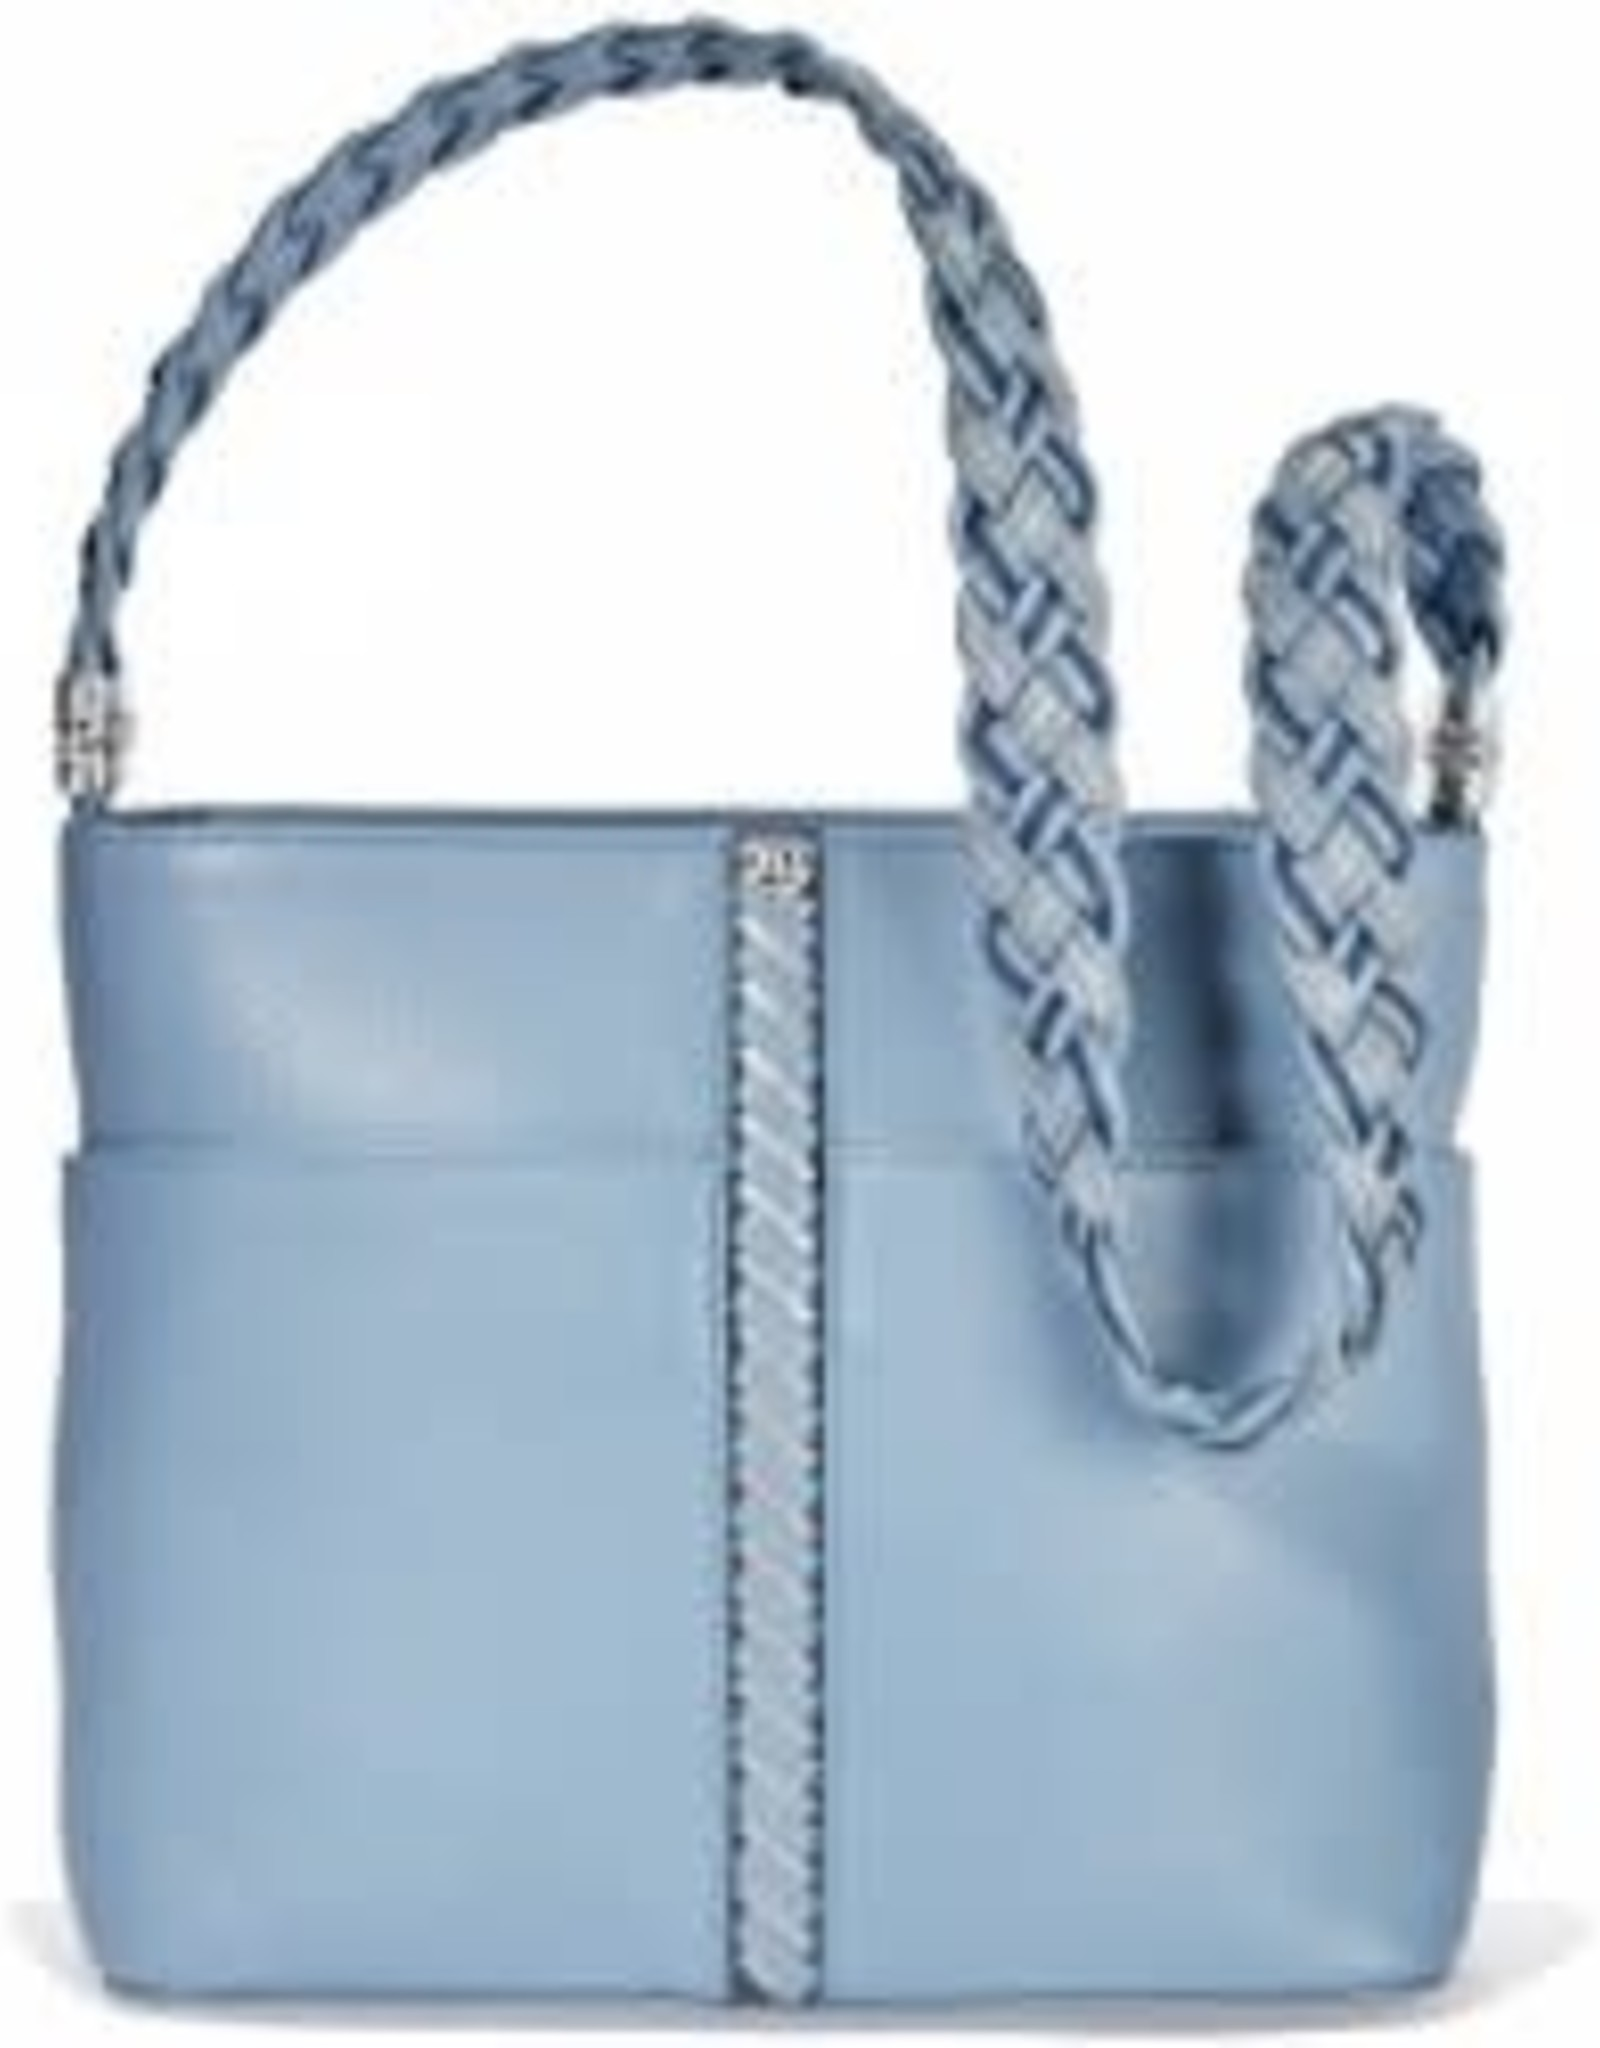 Brighton Brighton Handbag Beaumont Square Bucket Bag - Heaven Blue, OS